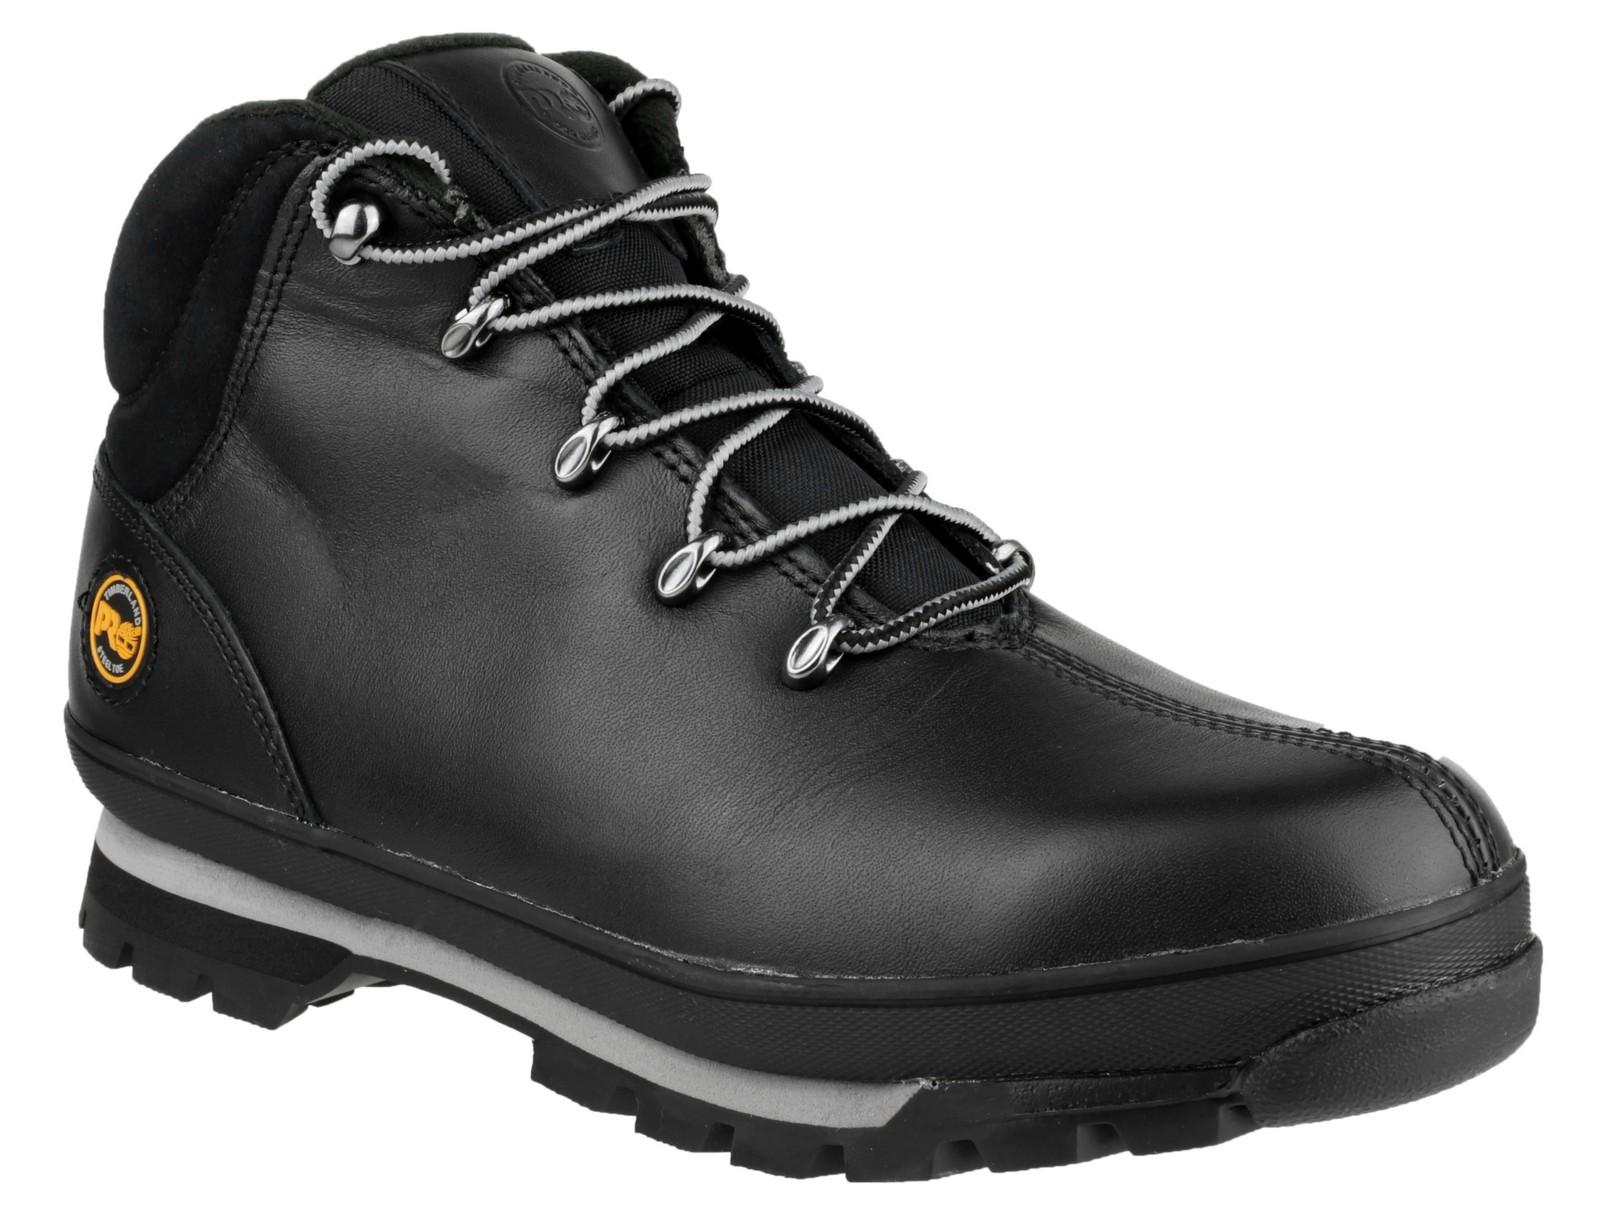 6a218287fa6 Timberland Splitrock Pro Safety Boots (Black)